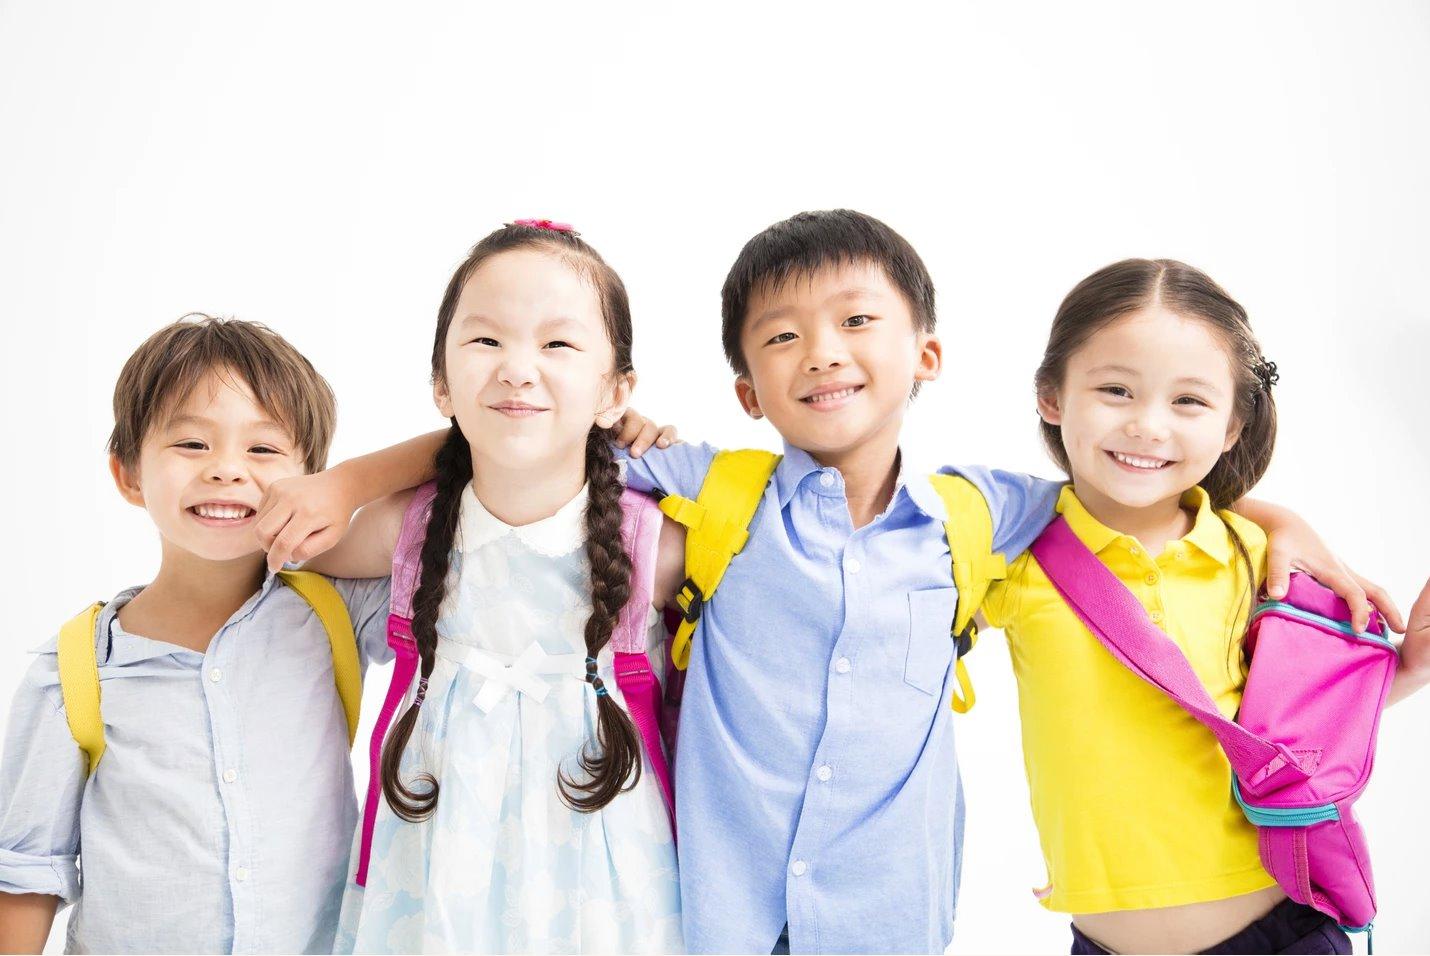 { en: 'French Teachers Association of Hong Kong', cn: '香港法國教師協會' } 1